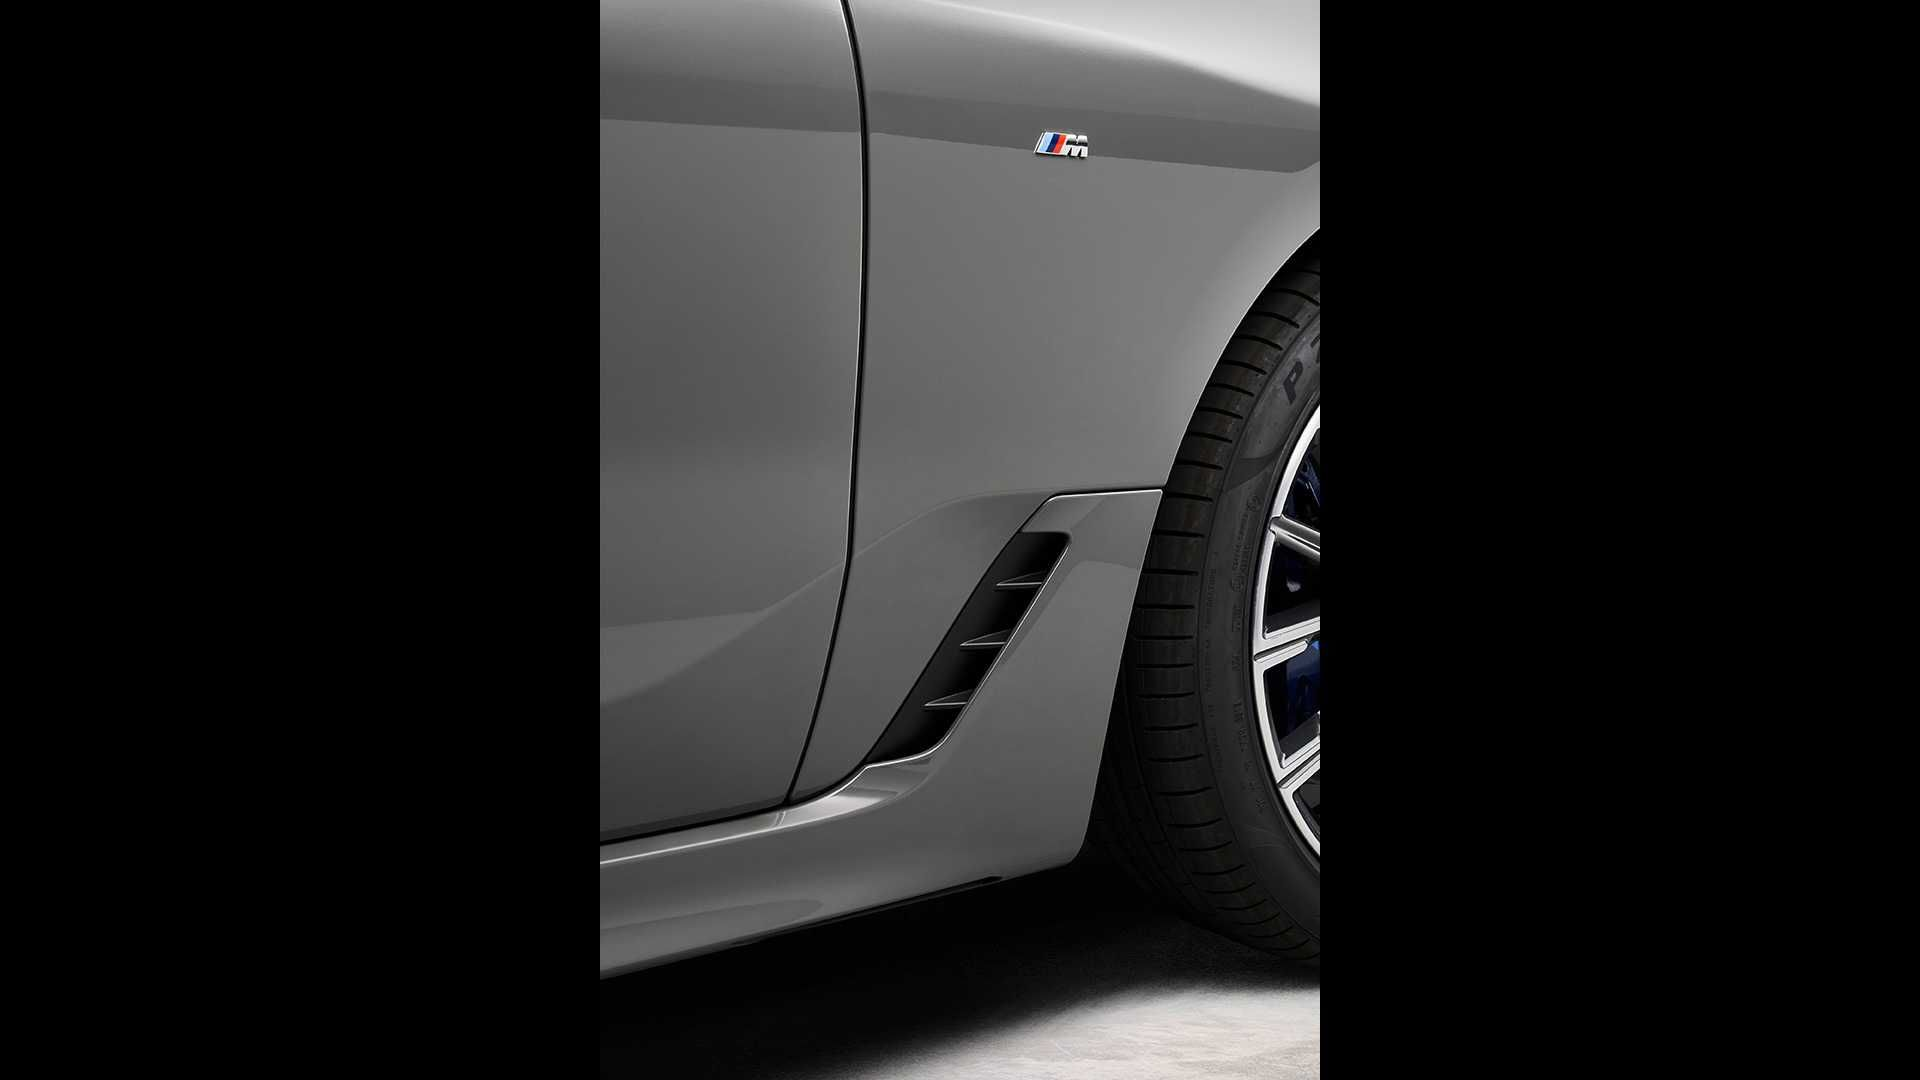 BMW-6-Series-GT-Gran-Turismo-facelift-2021-21